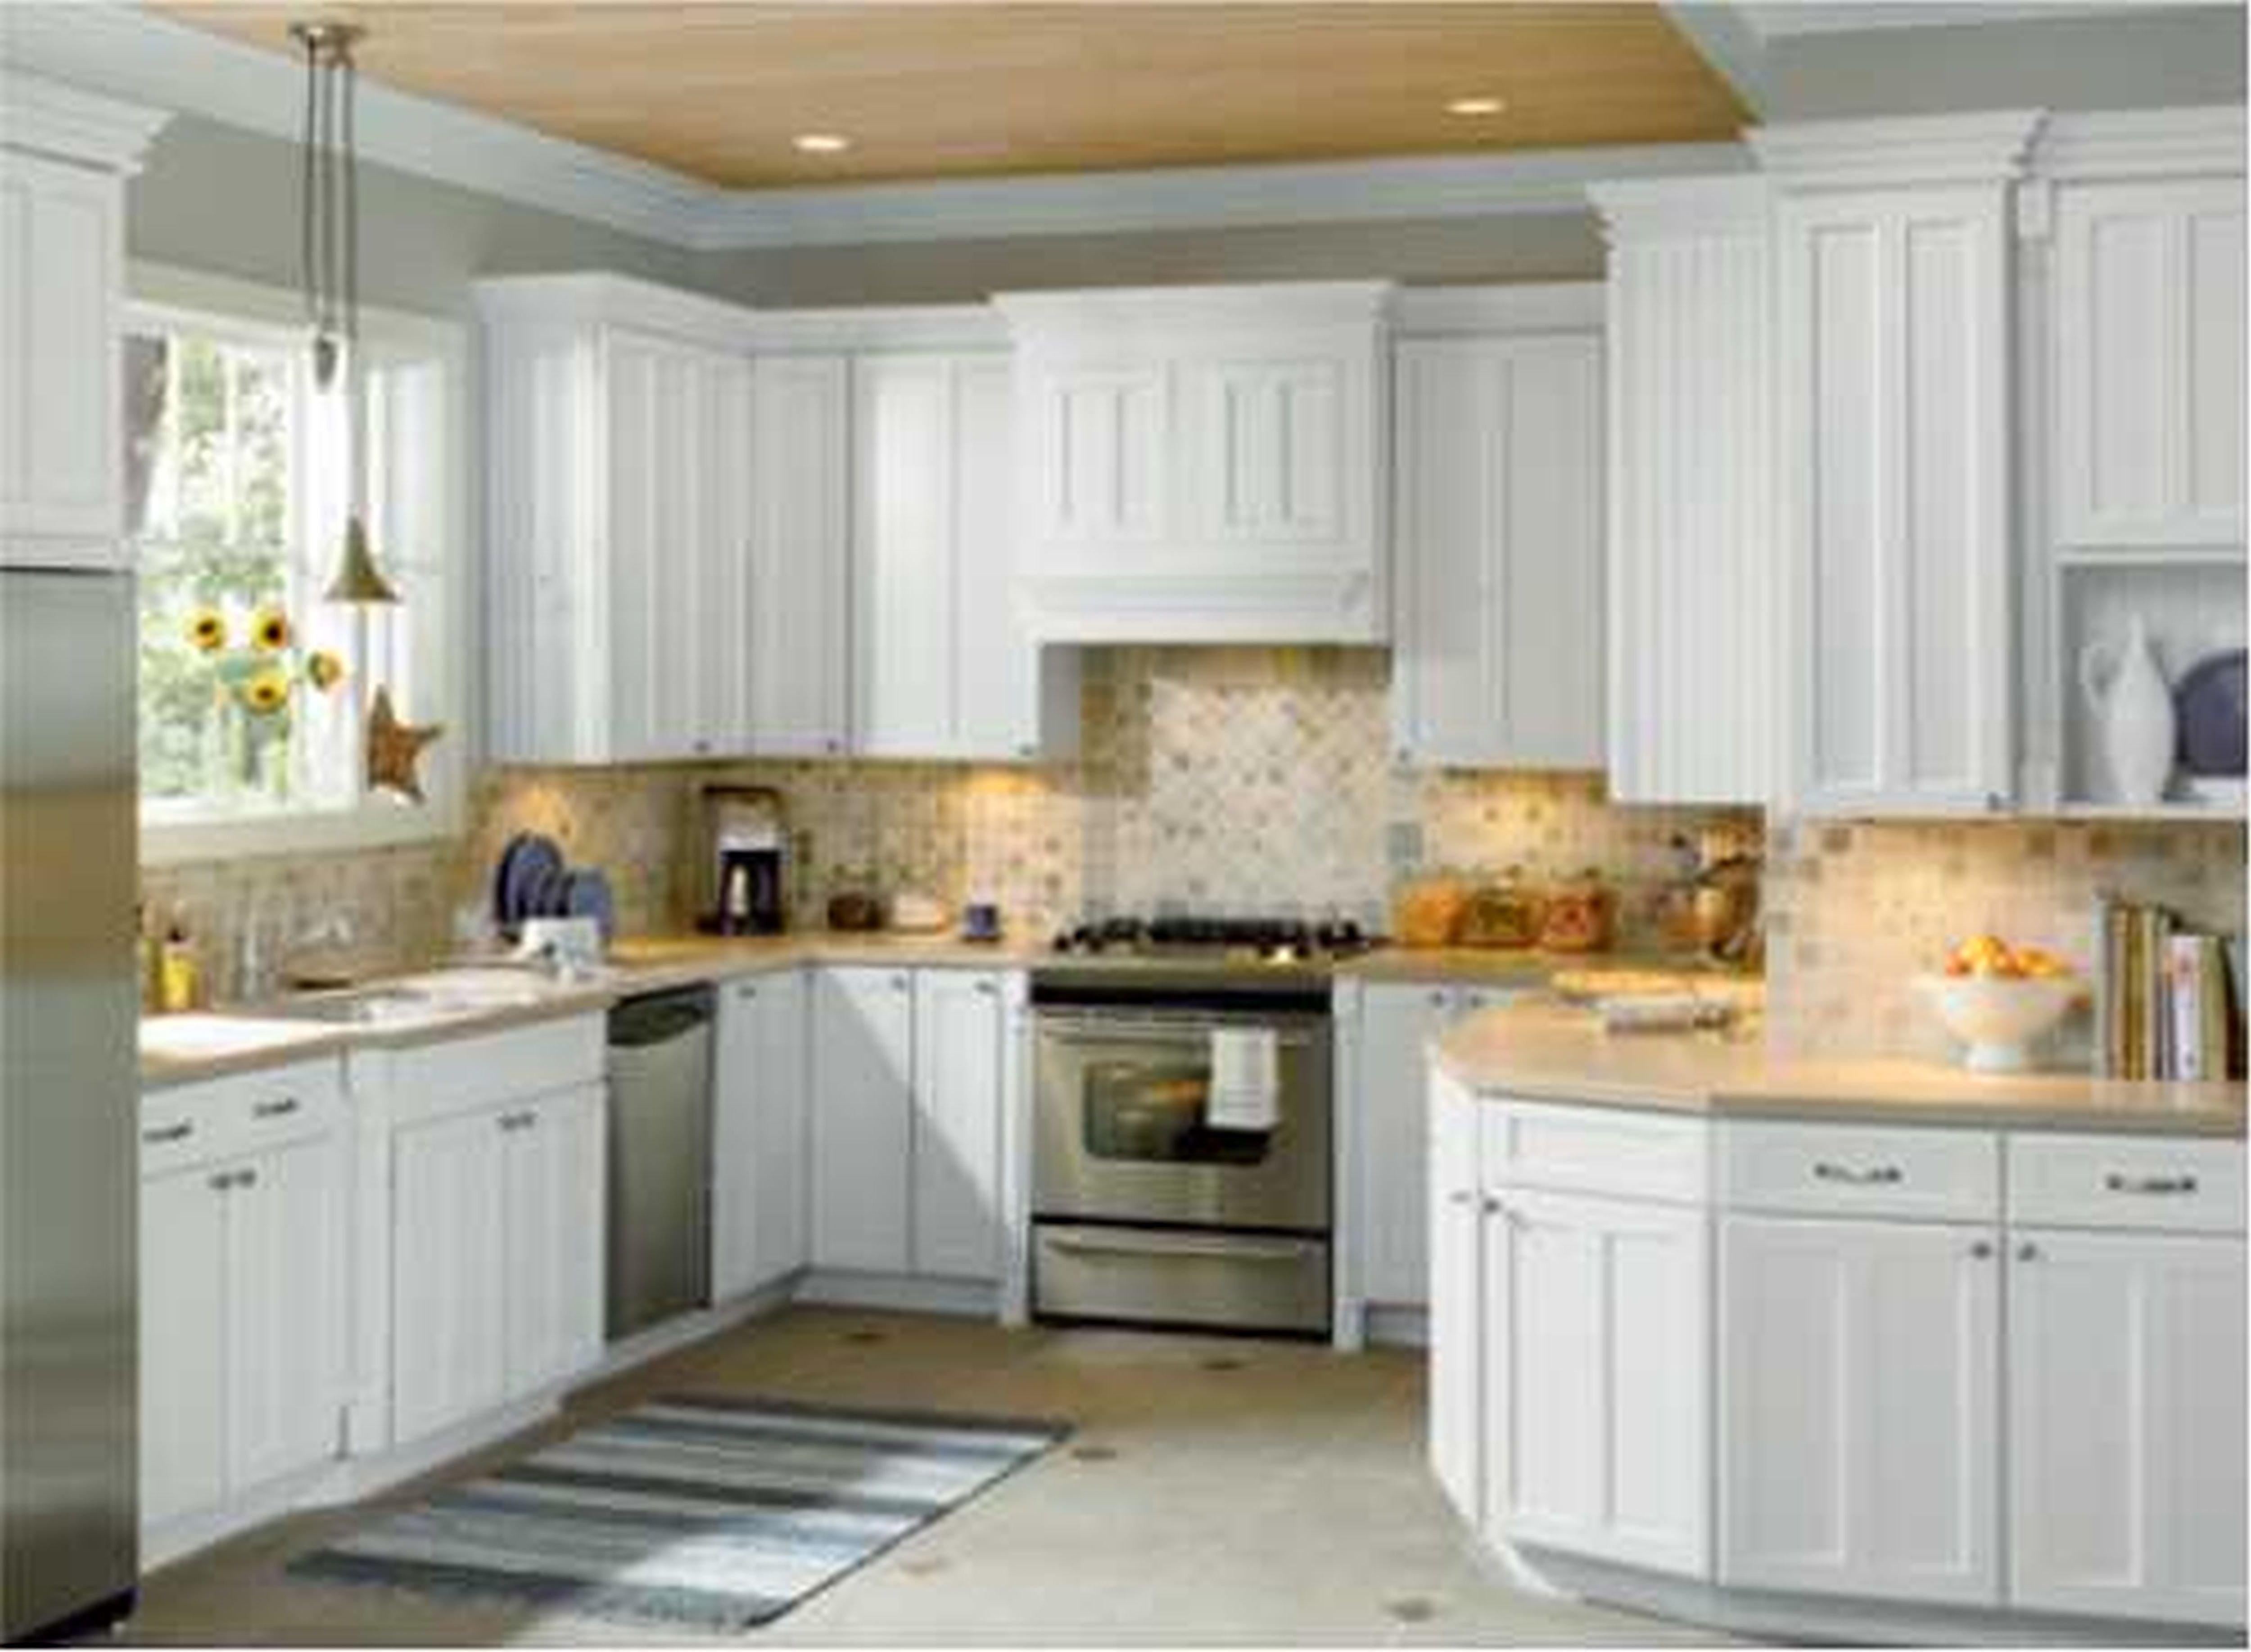 10 Stunning Backsplash Ideas For Kitchens Inexpensive rectangle silver sink decor idea kitchen backsplash ideas for white 2021